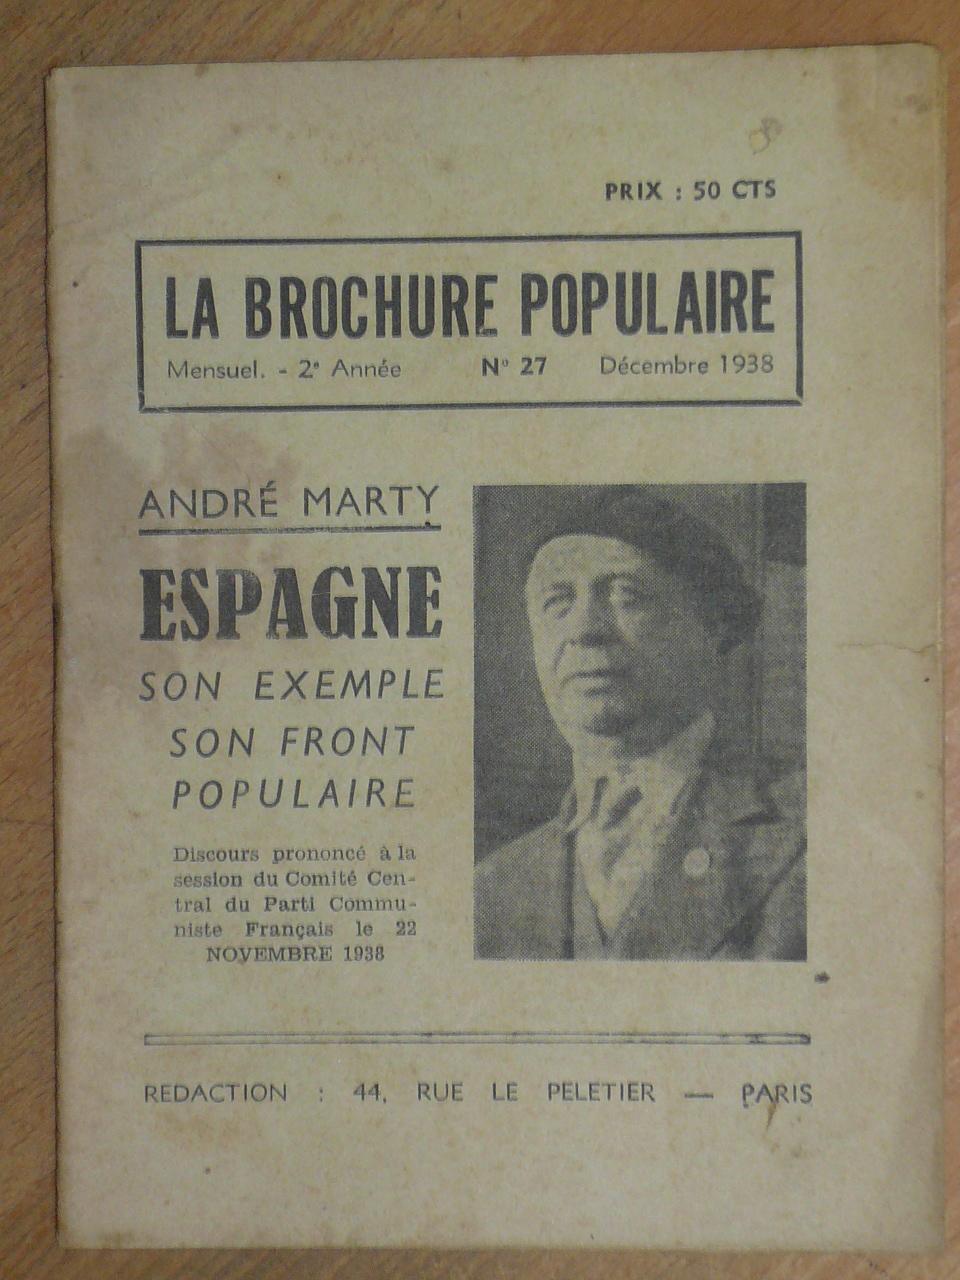 Espagne, son exemple, son front populaire. Discours: Marty, André.